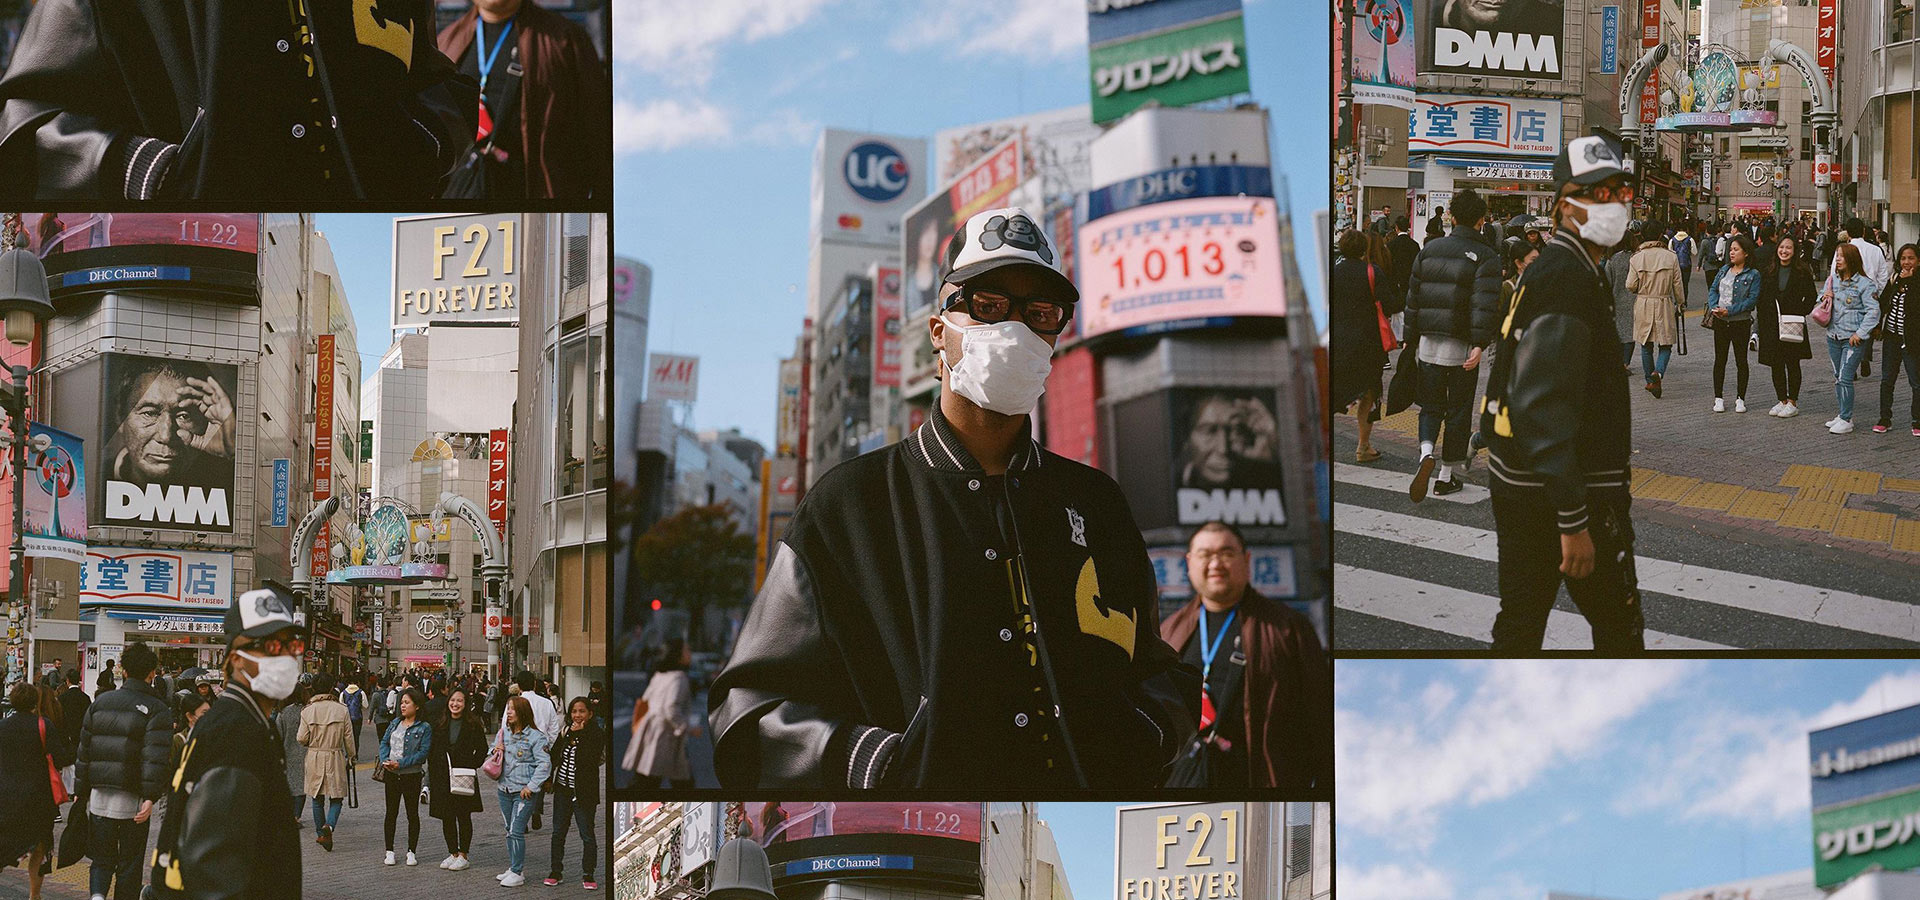 Suddenly Metro Boomin appears Tokyo driftin' & wantin' sum more at 渋谷区 Street.